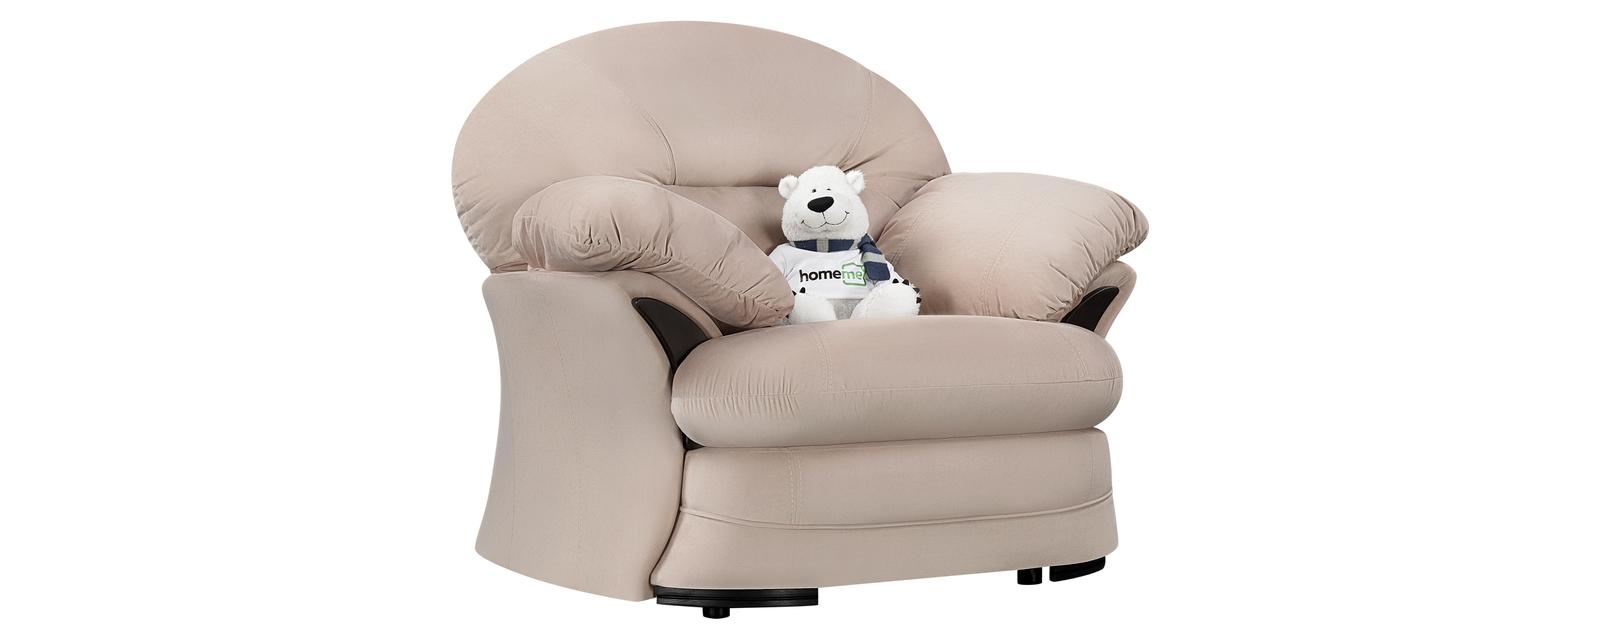 Кресло HomeMe Ланкастер от Homeme.ru